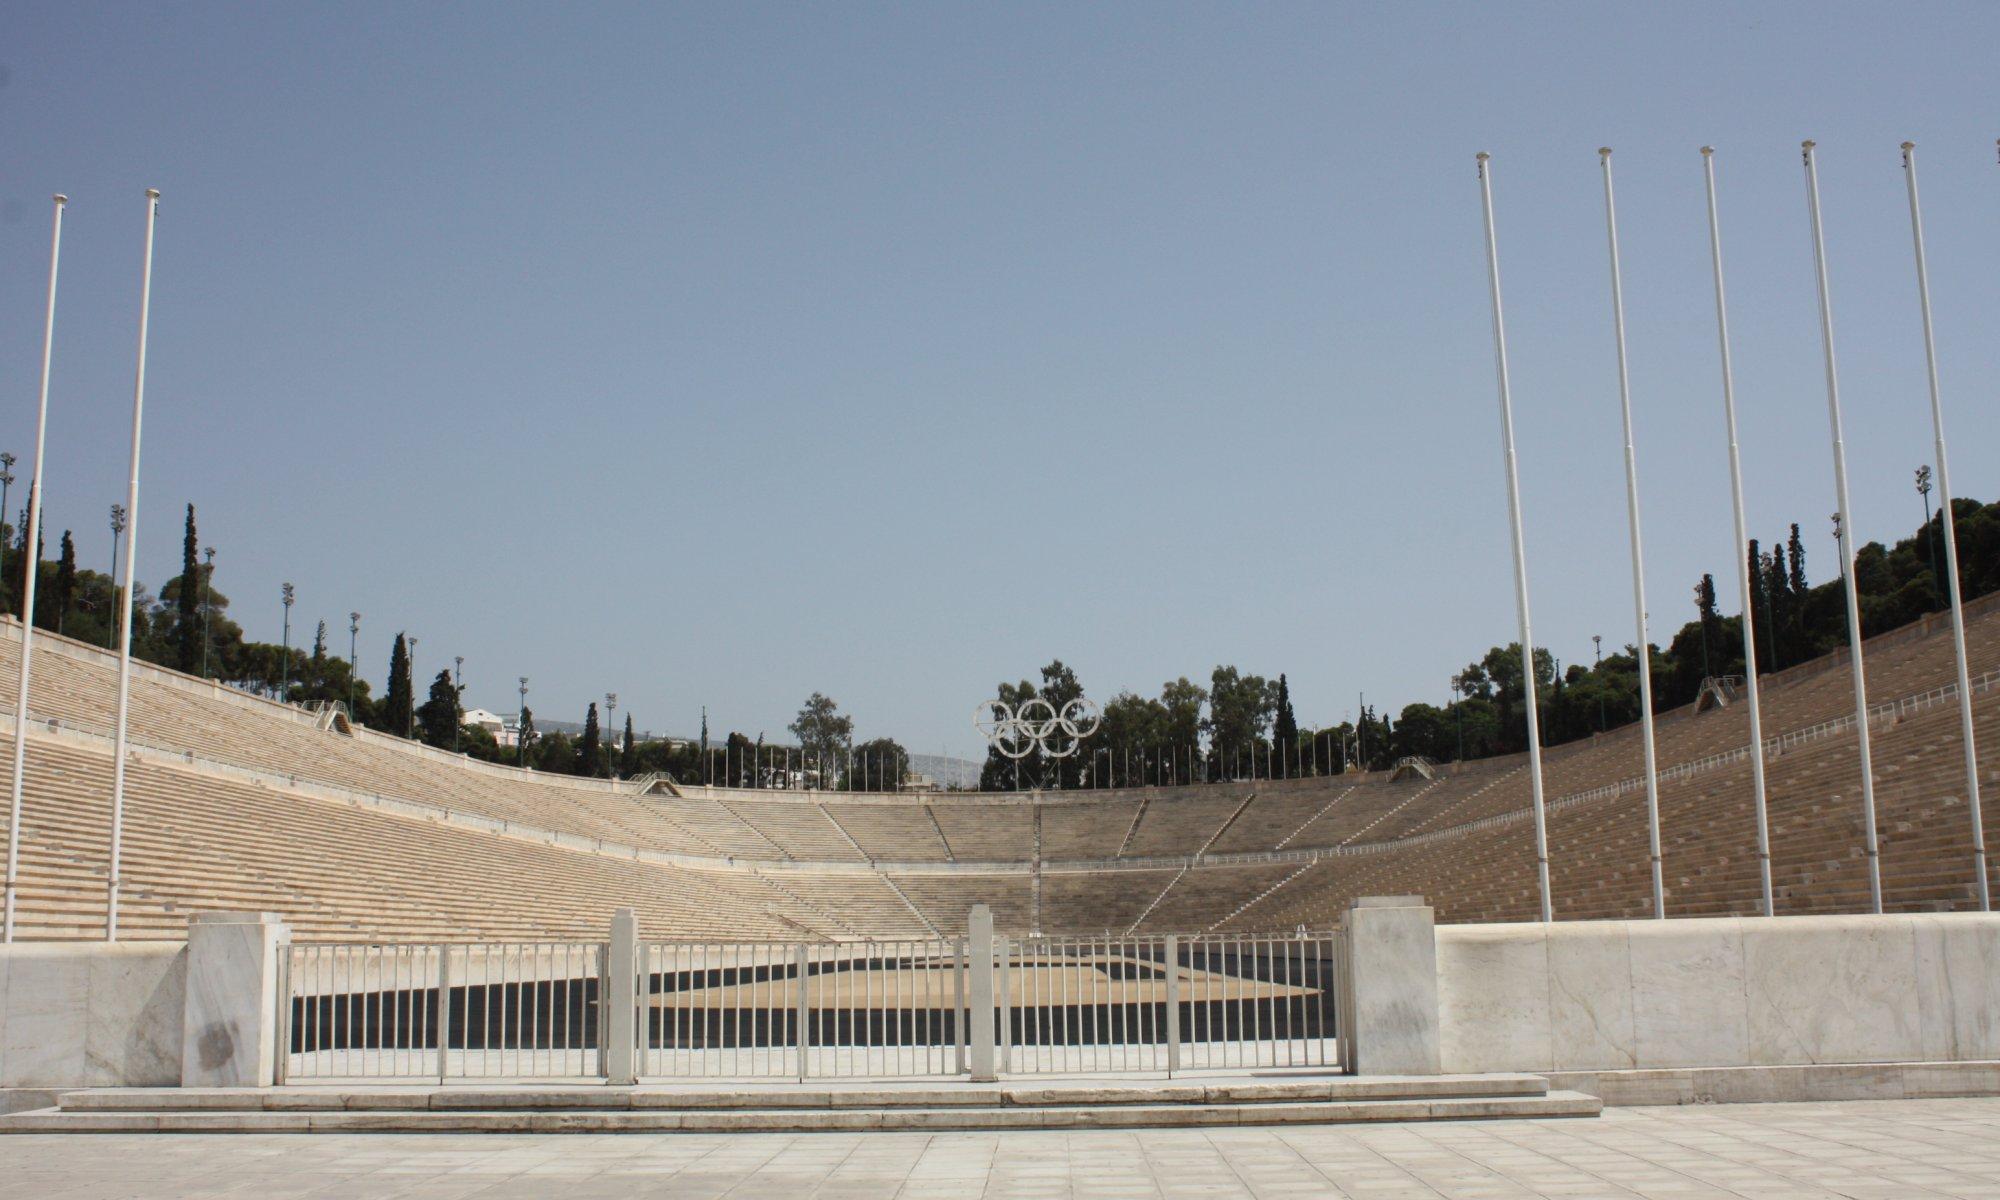 Olympic stadium, Αθήνα, Greece